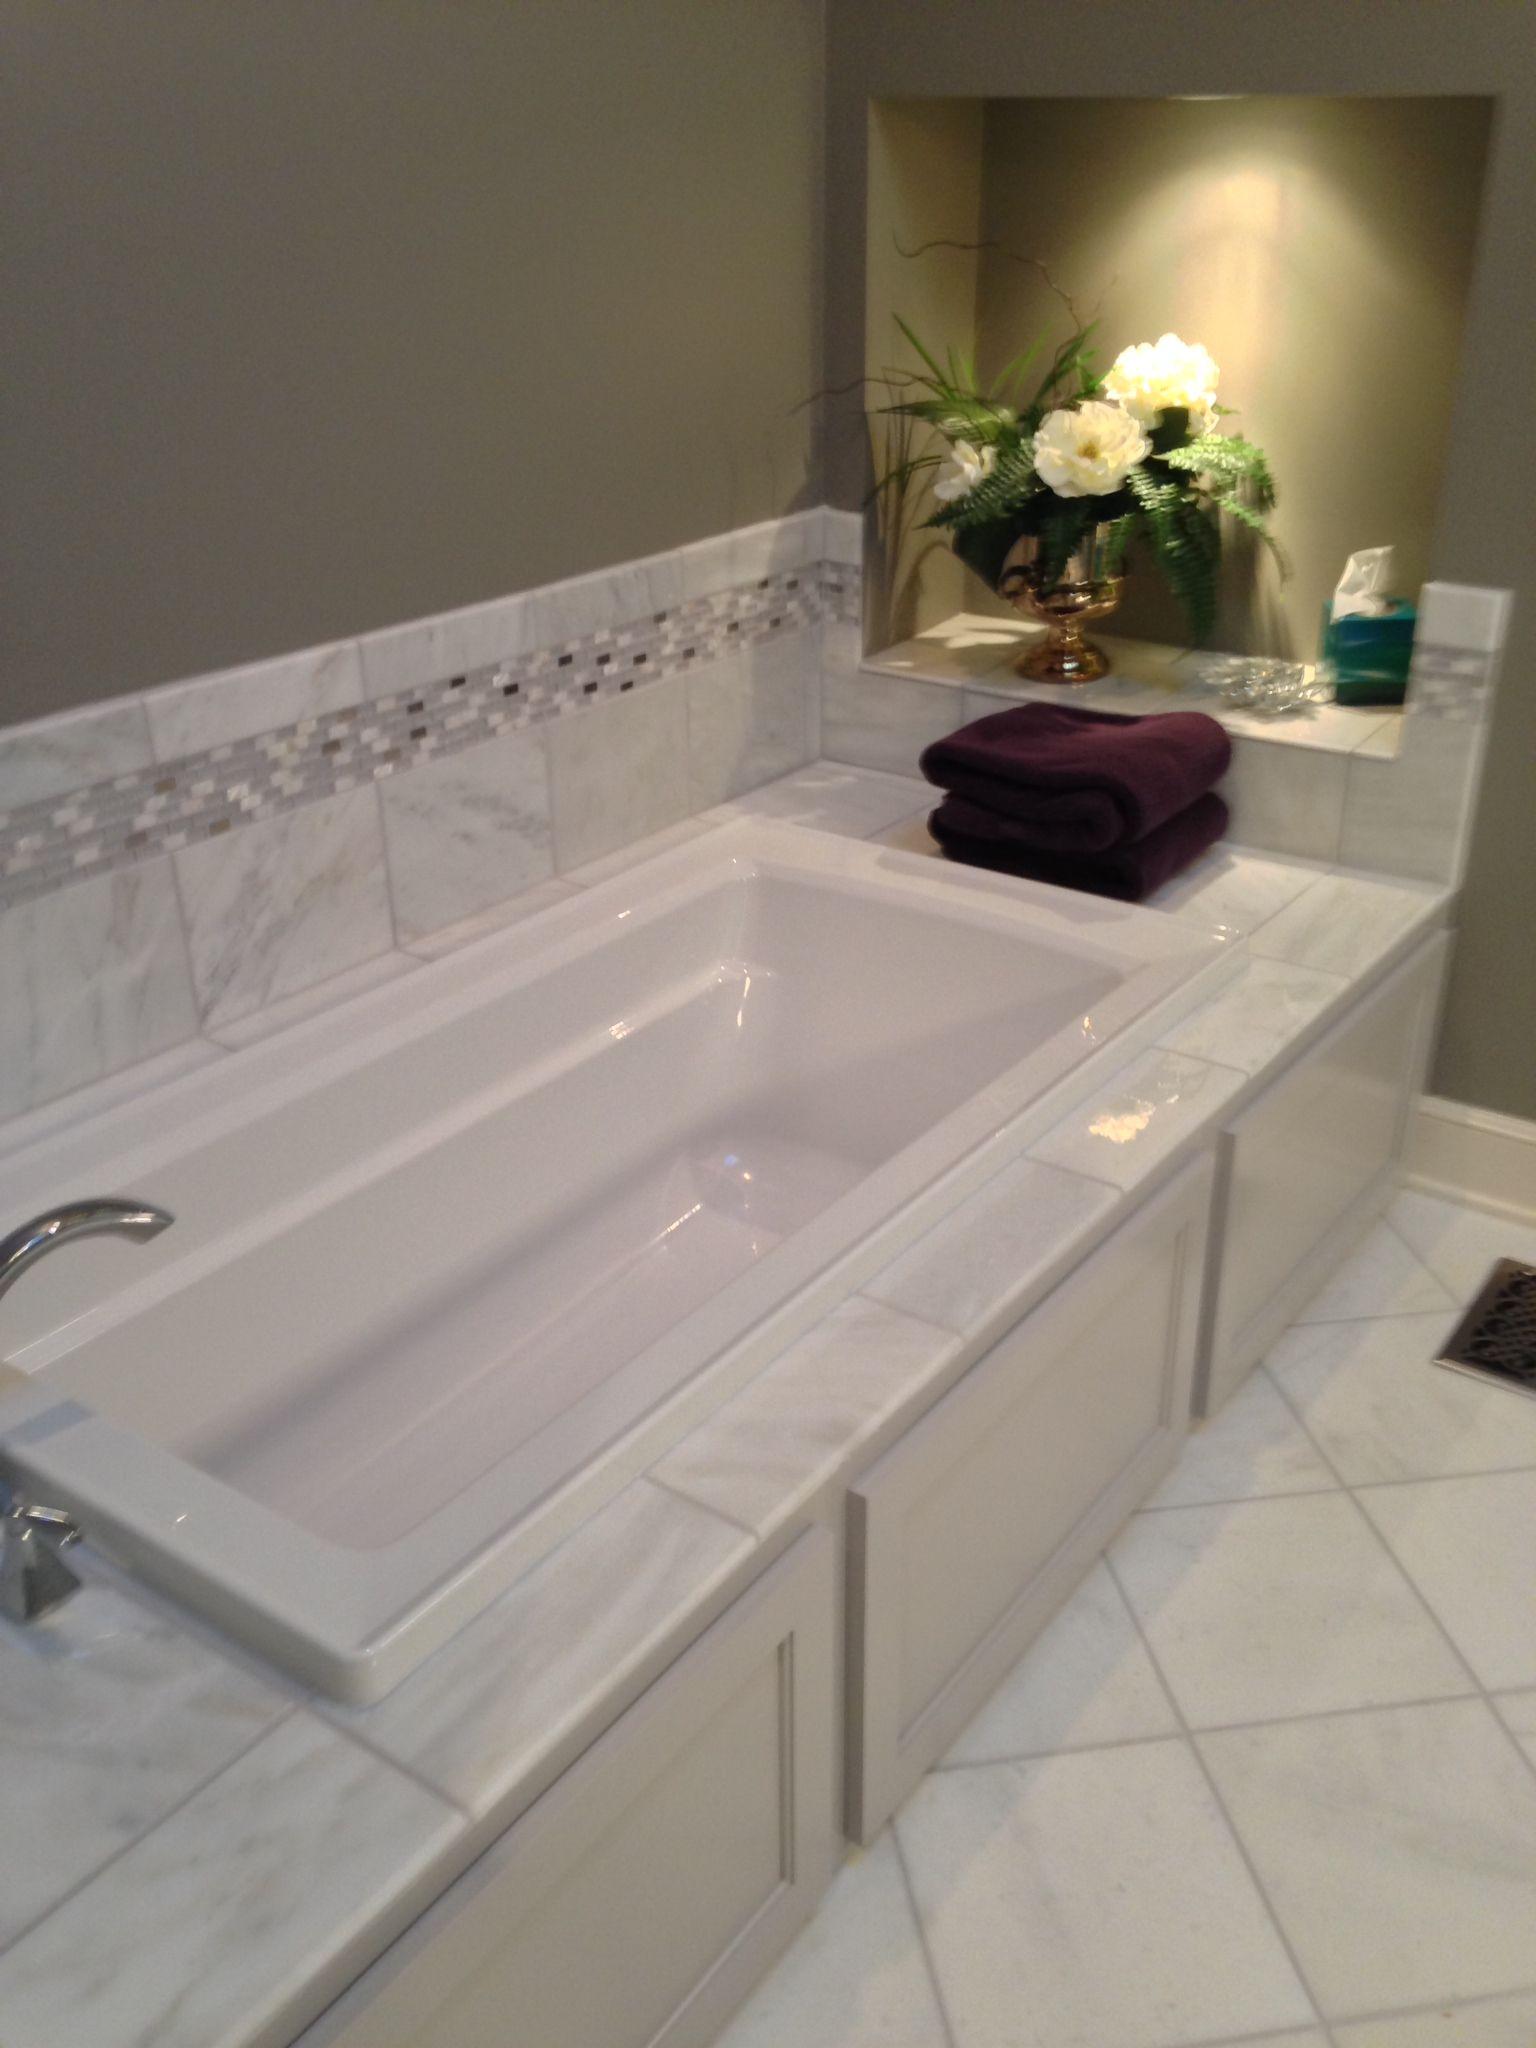 Bathroom Ideas With Soaker Tubs